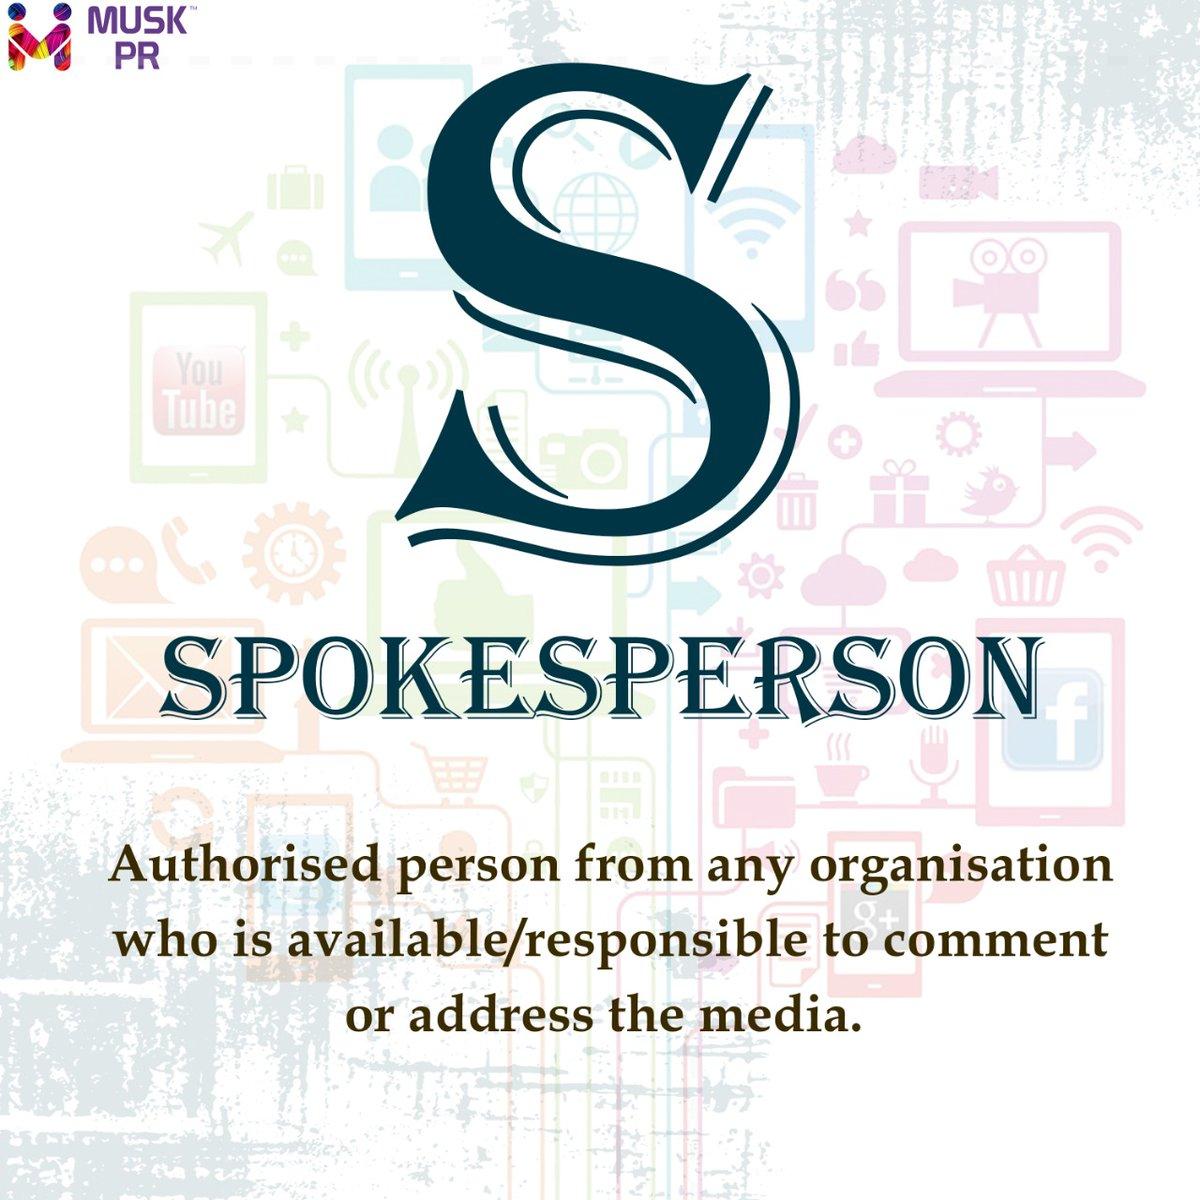 S for Spokesperson  #muskpublicrelations #Jaipur #AtoZpic.twitter.com/pW7qt5GOTt